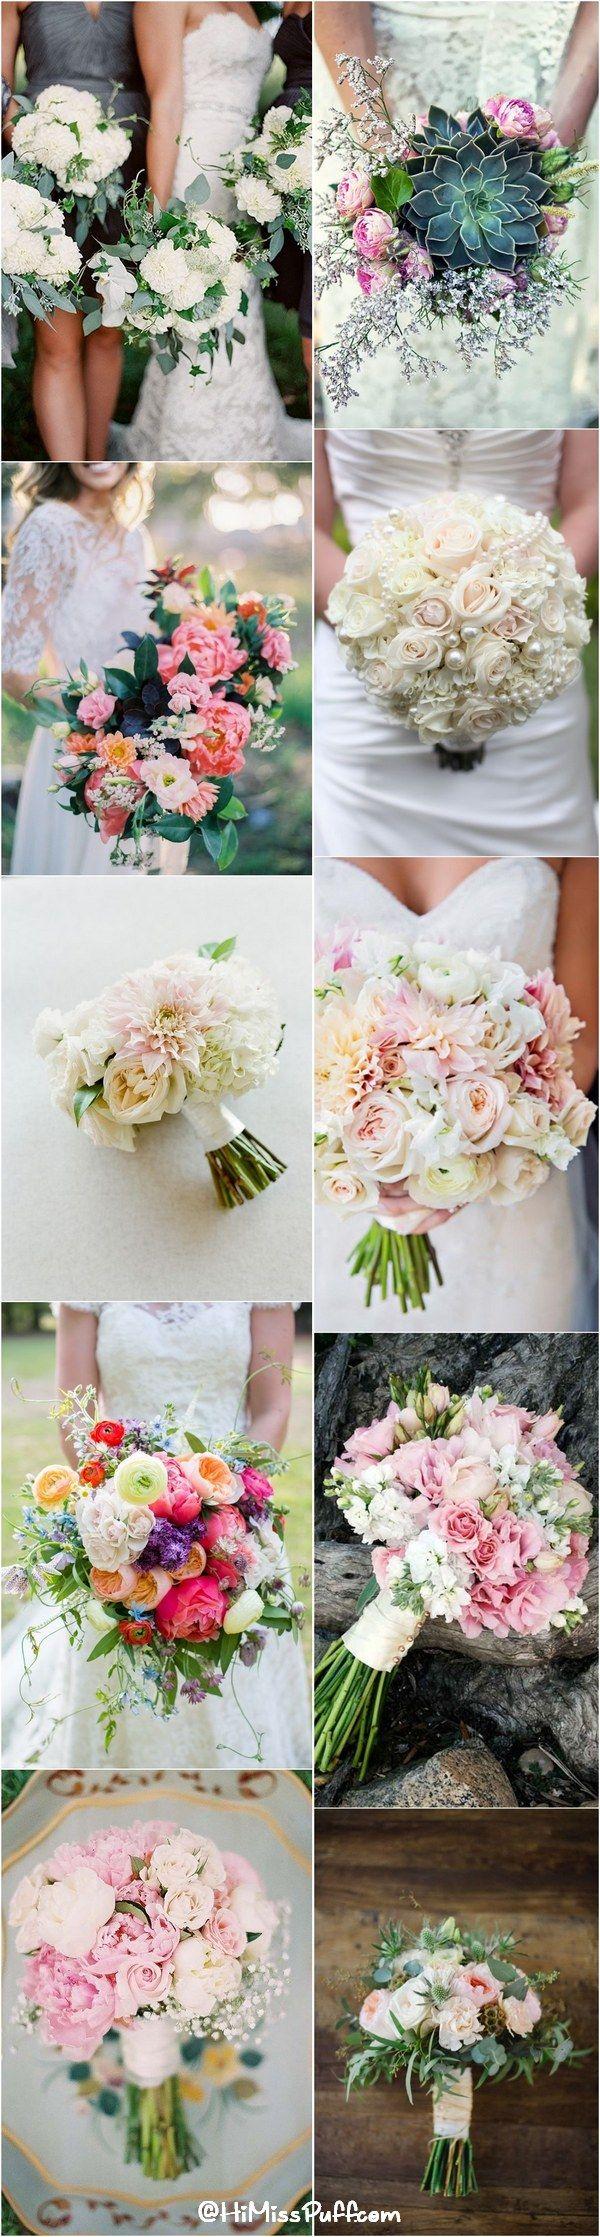 Romantic Spring & Summer Wedding Bouquets / http://www.himisspuff.com/spring-summer-wedding-bouquets/